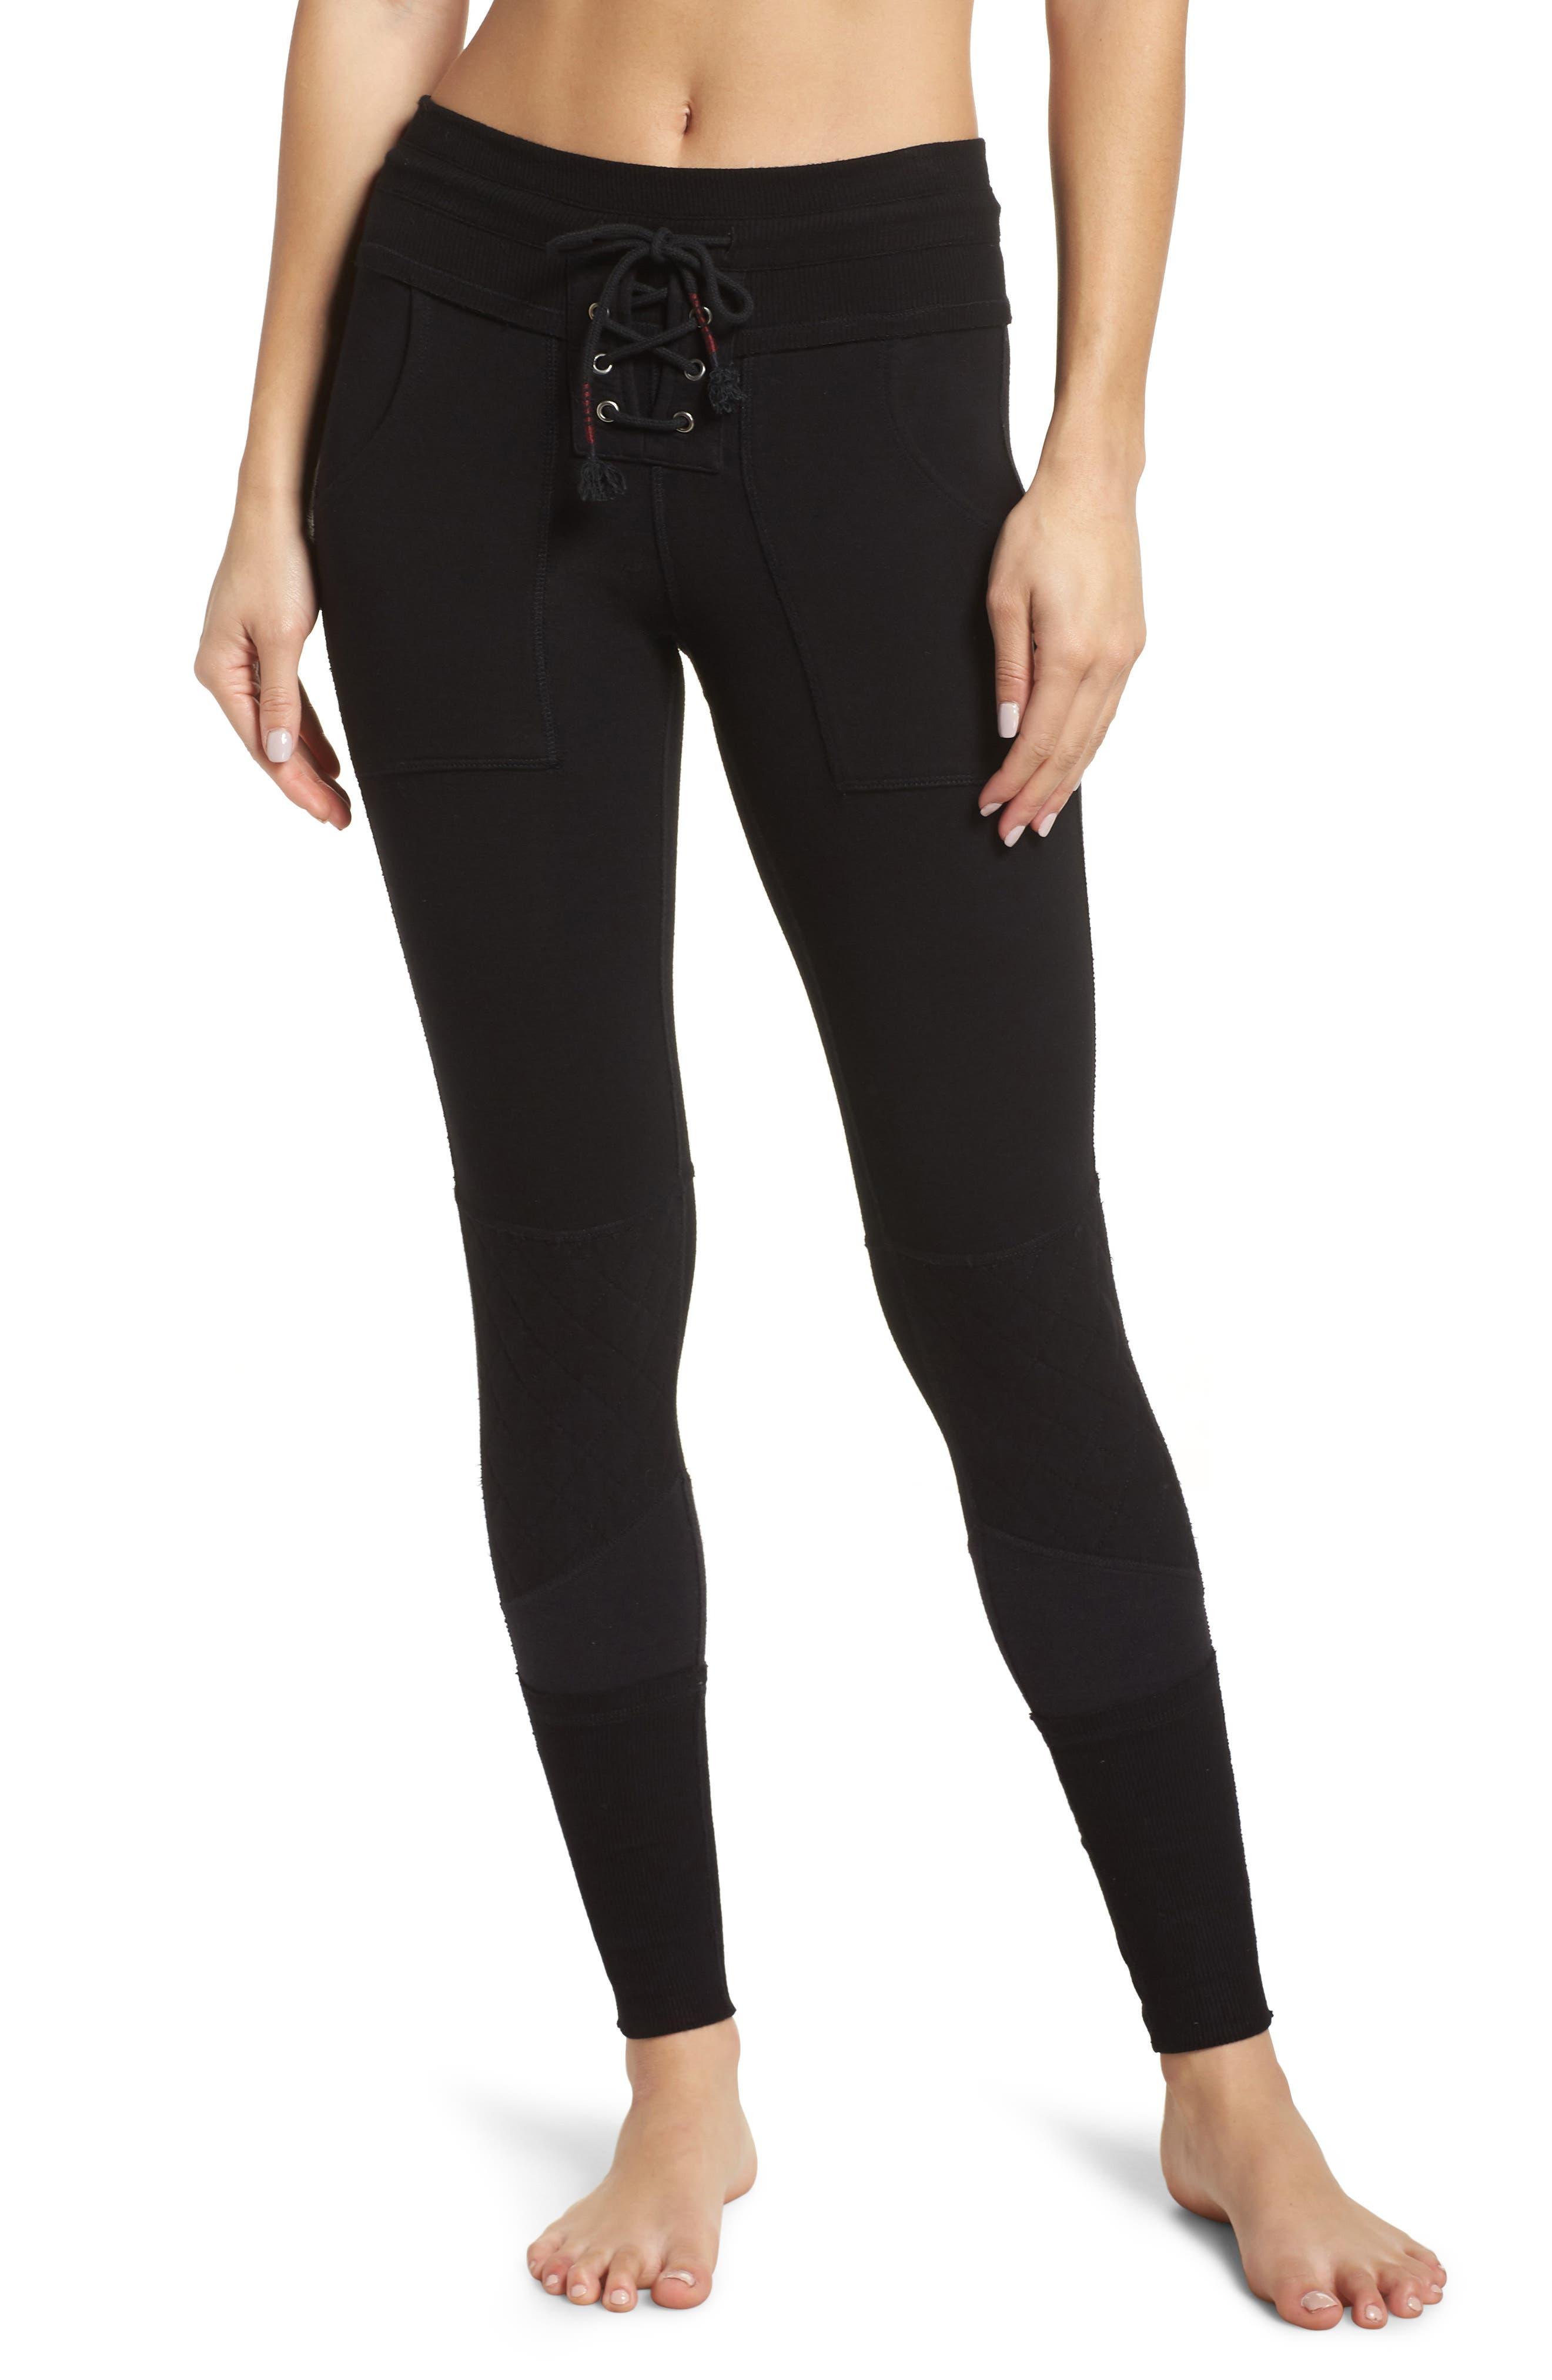 FP Movement Surya High Waist Leggings,                         Main,                         color, BLACK